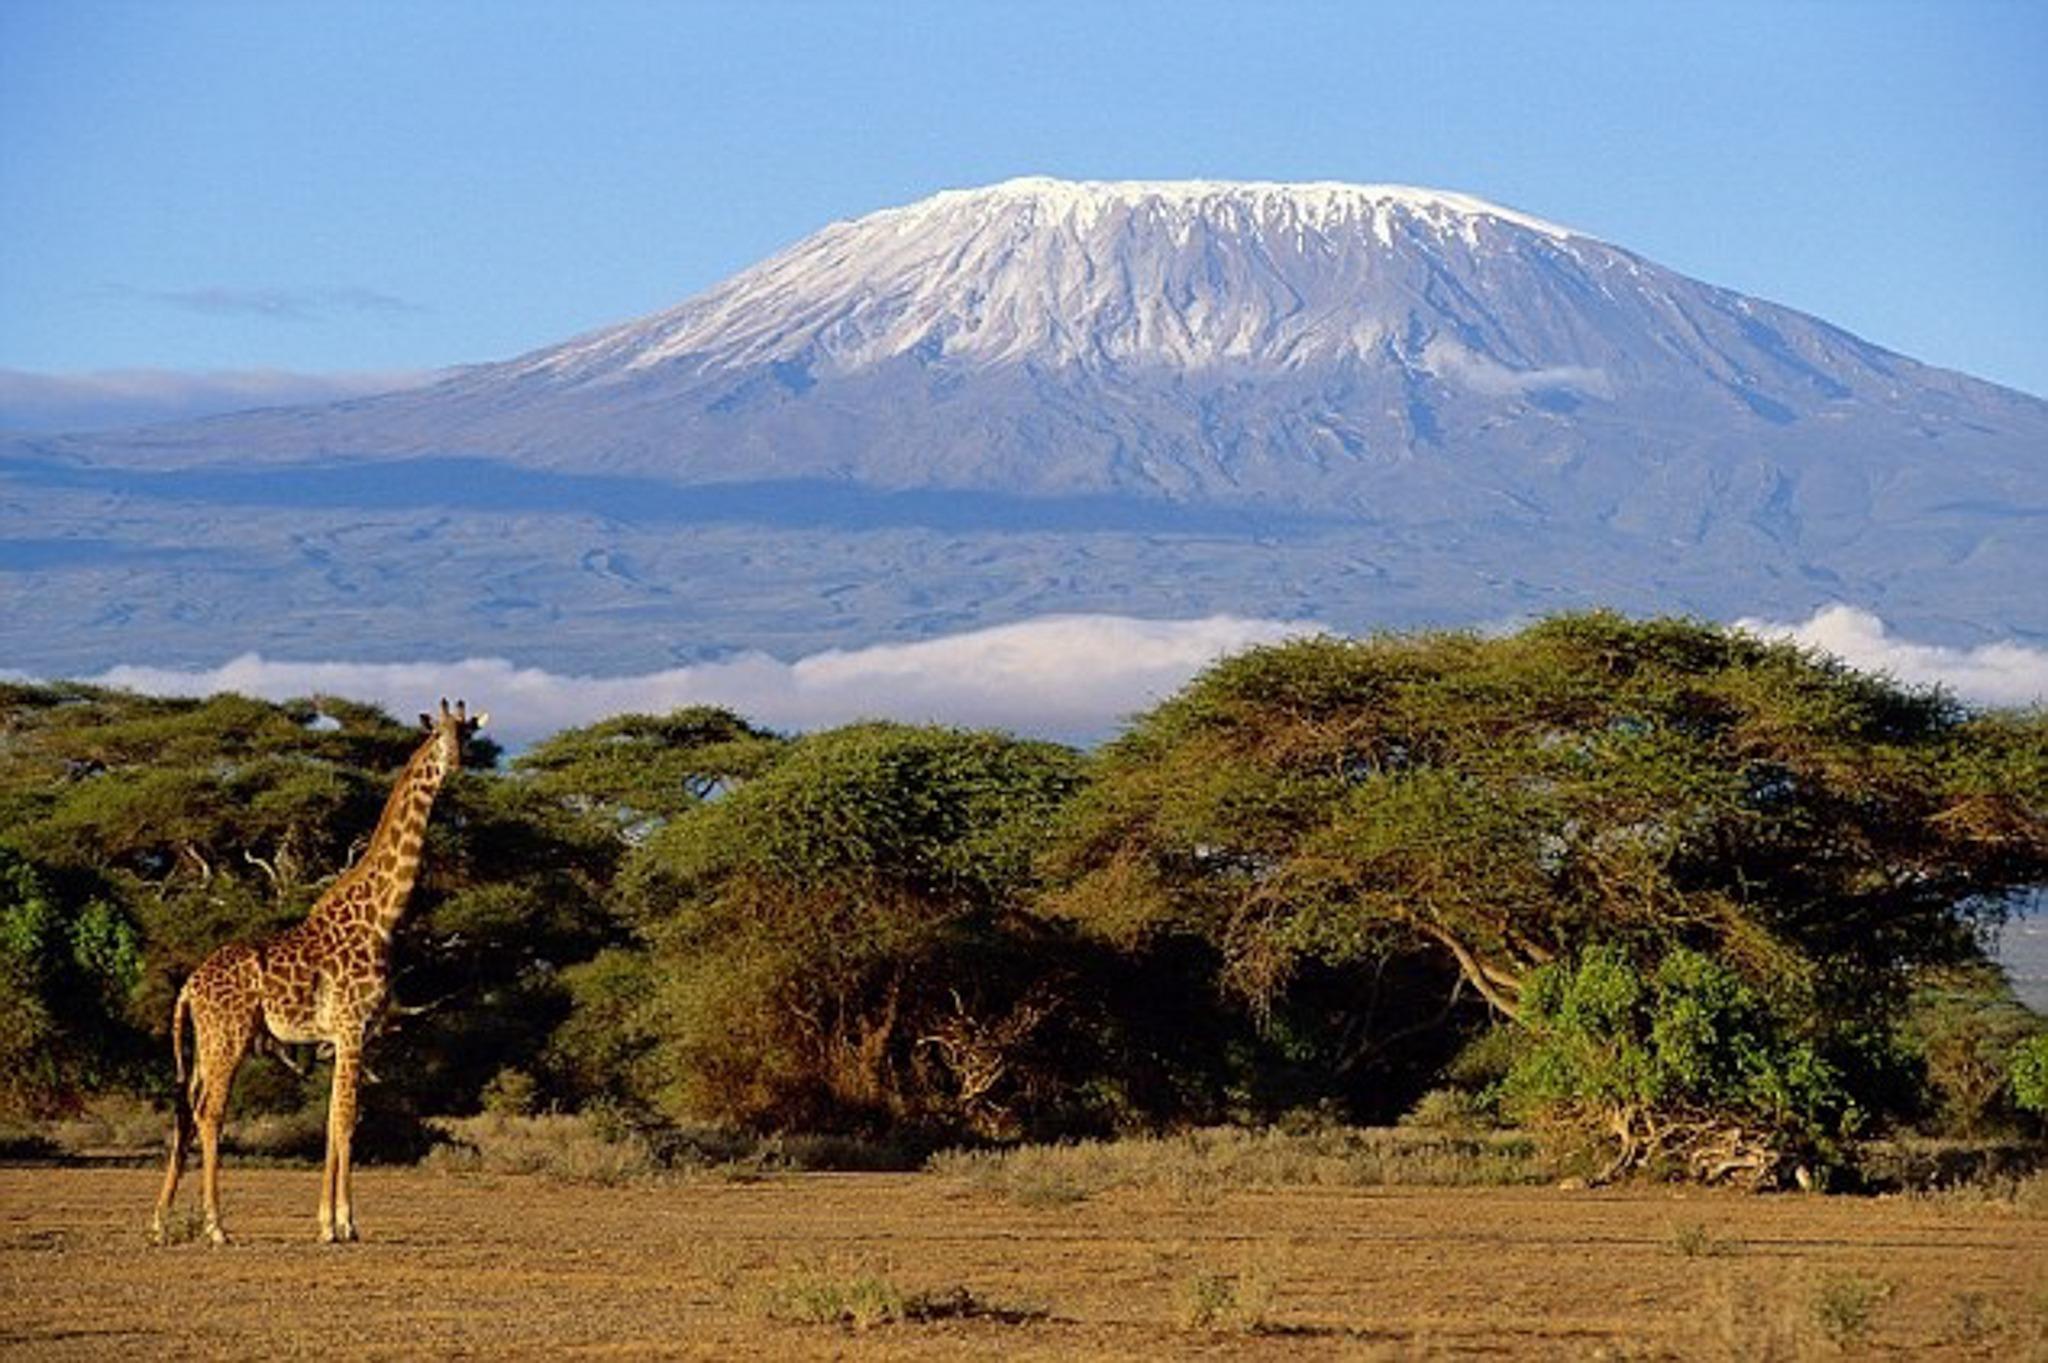 Kilimanjari_globalLandscapesForum_flickr